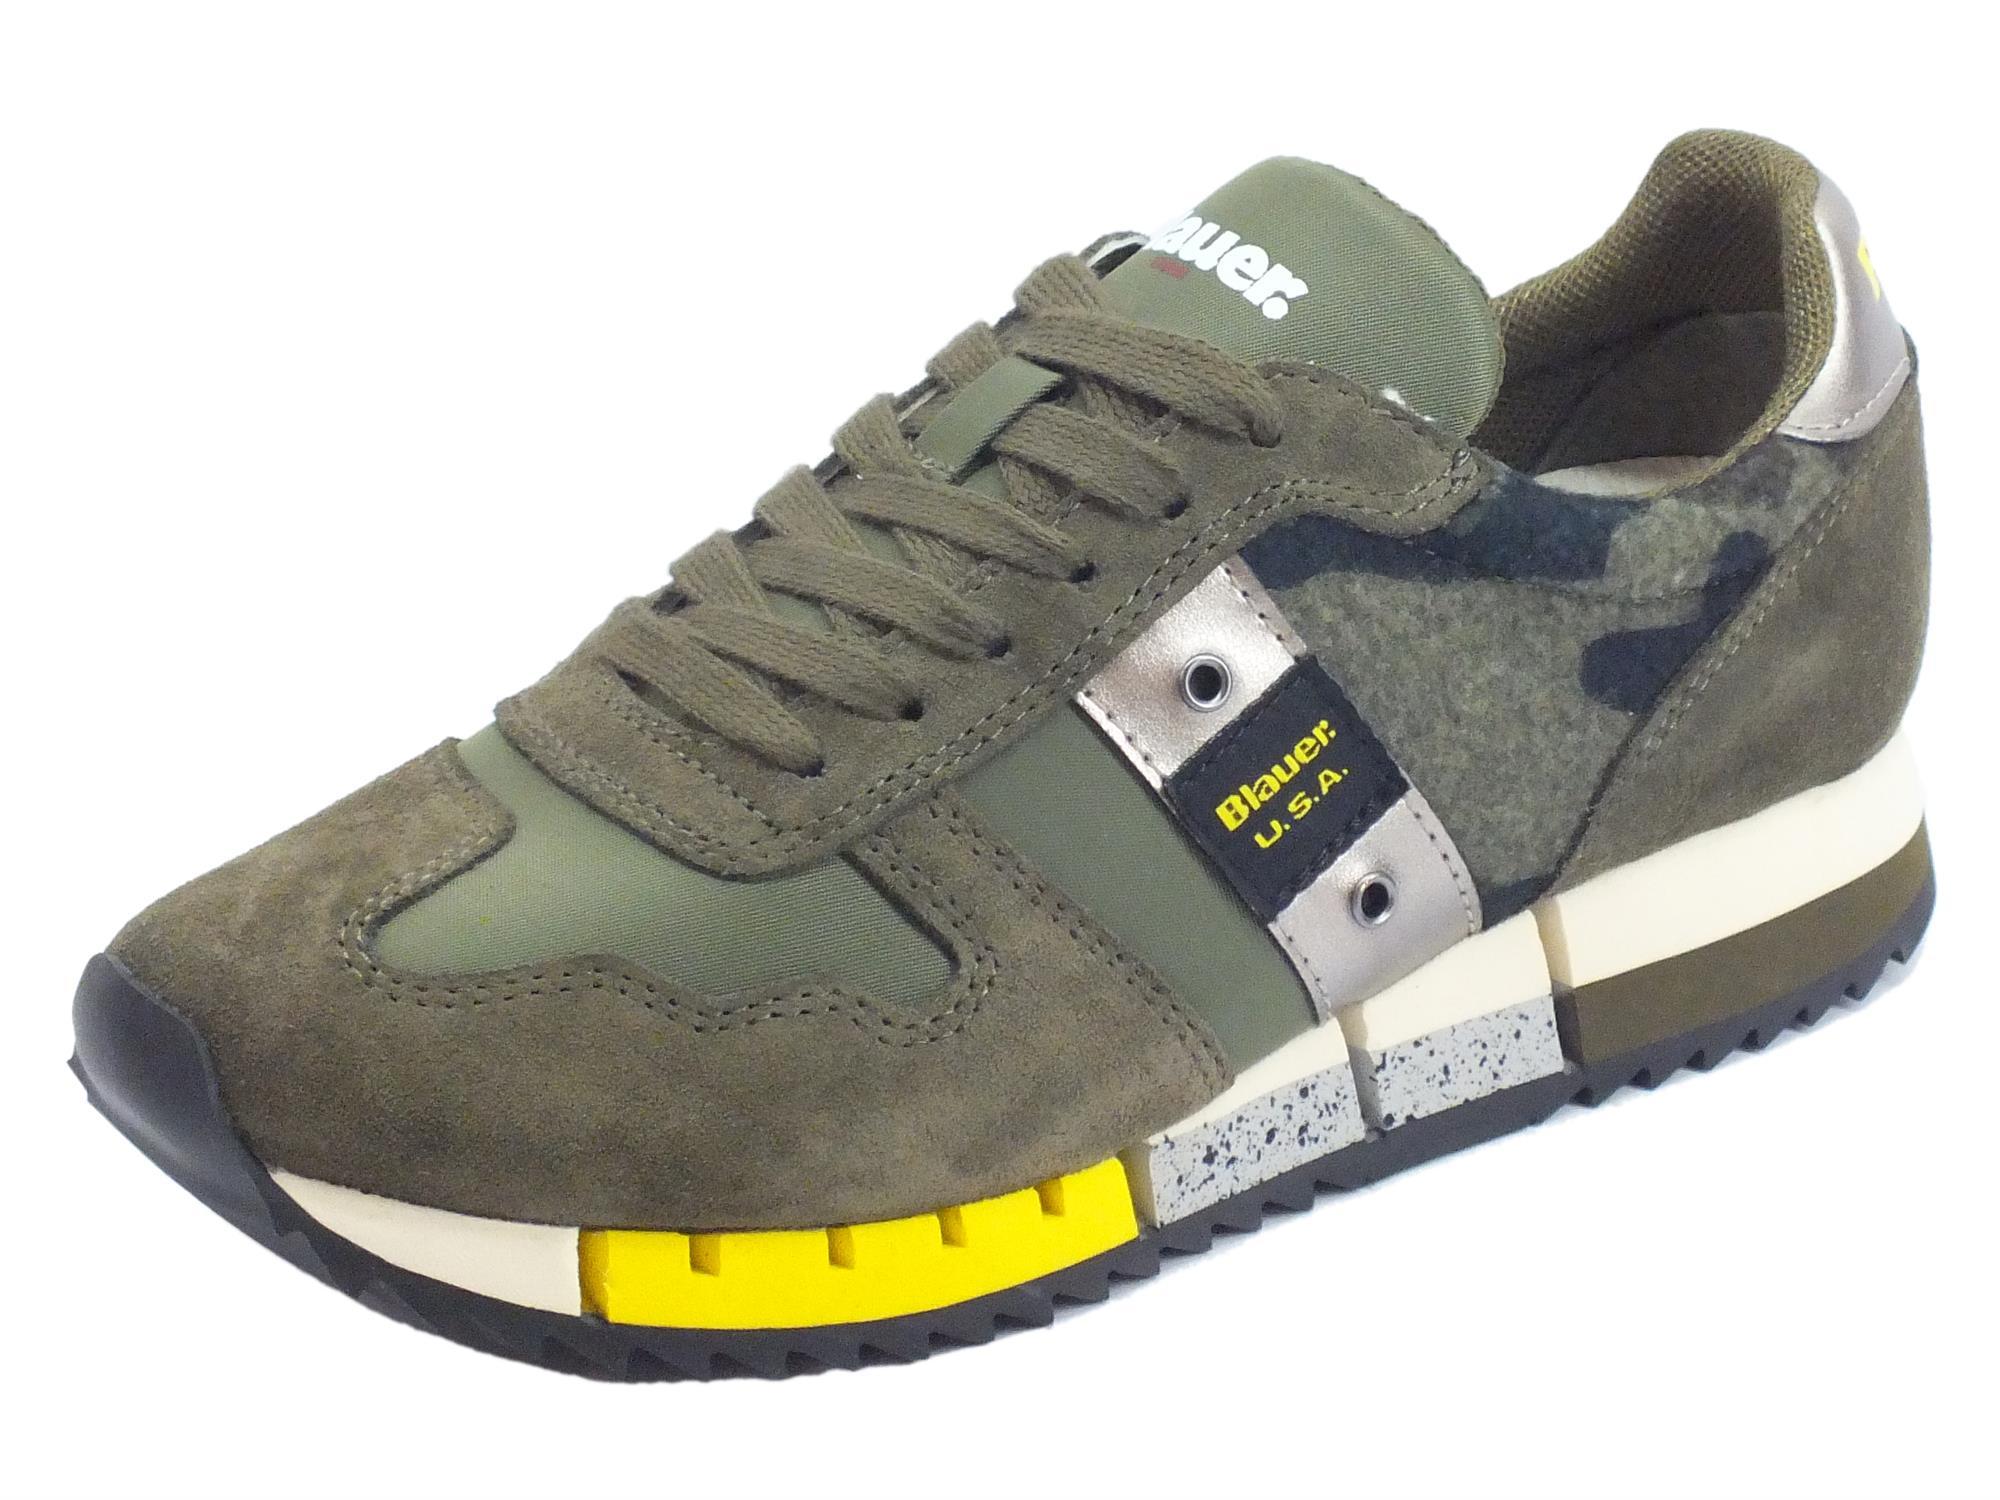 Sneakers Vitiello Melrose Usa Donna Verde Tessuto Blauer Camoscio rpqrnSvB